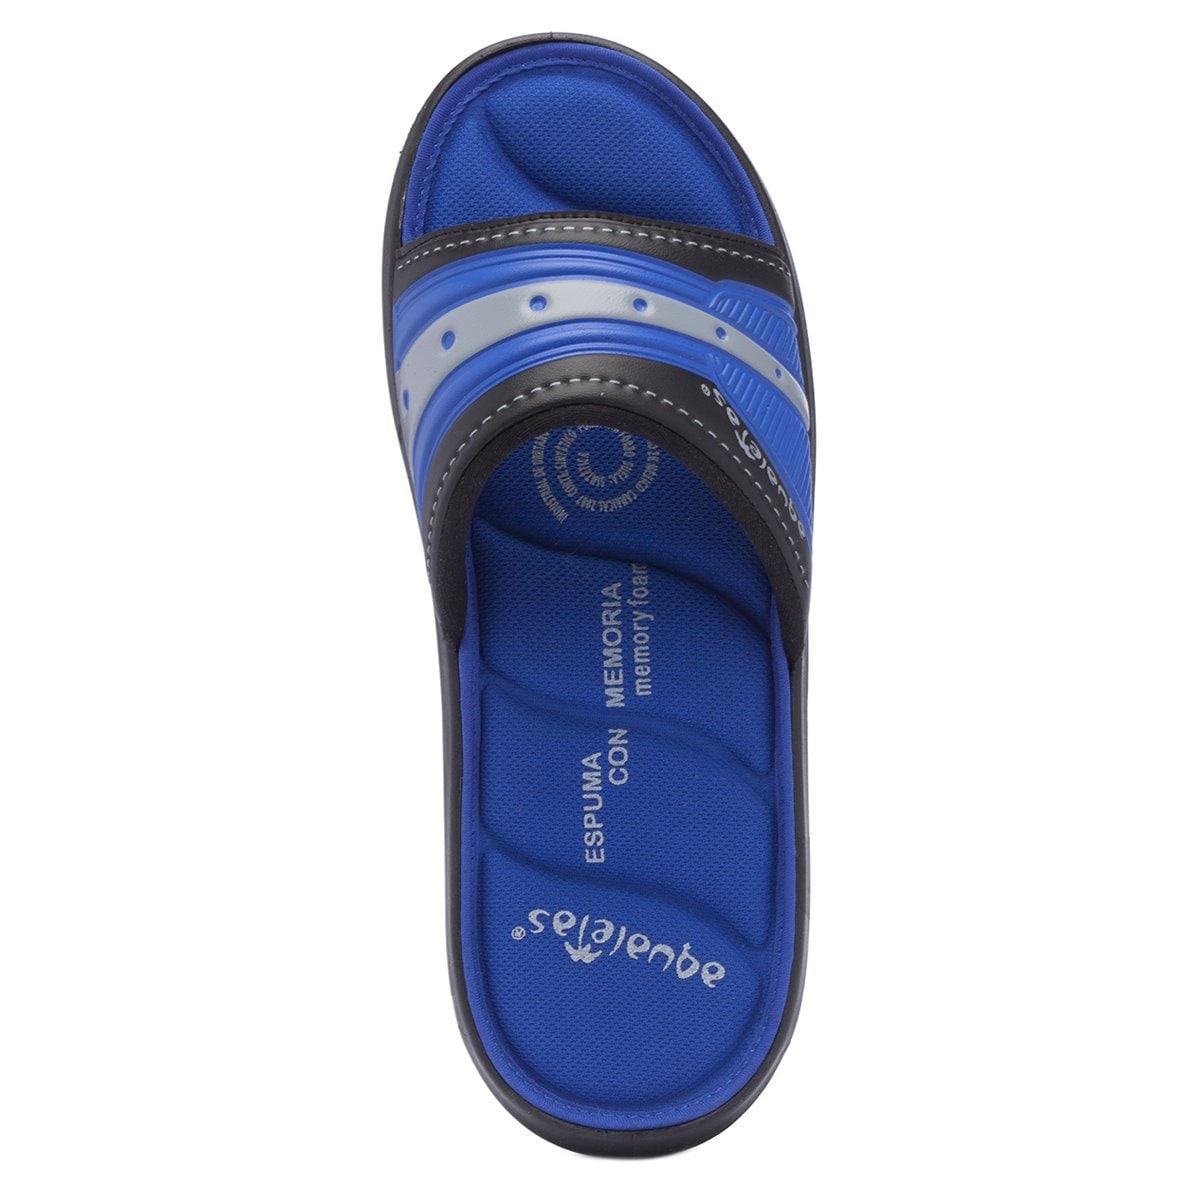 Sandalia Sintética Aqualetas